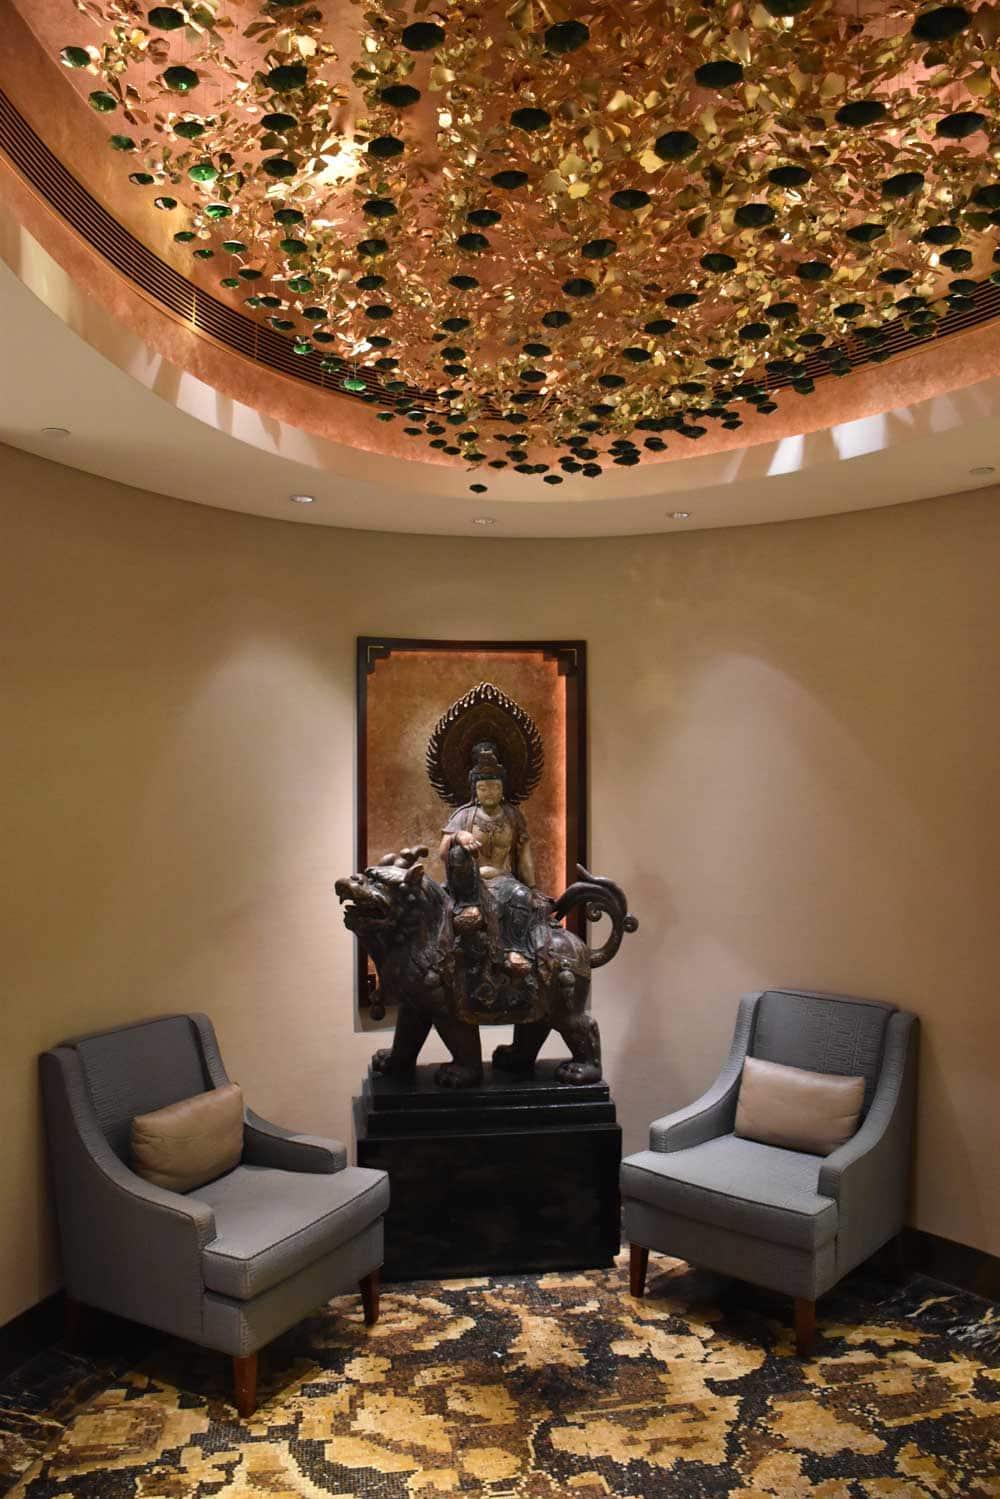 Grand Lapa Macau statee and chairs